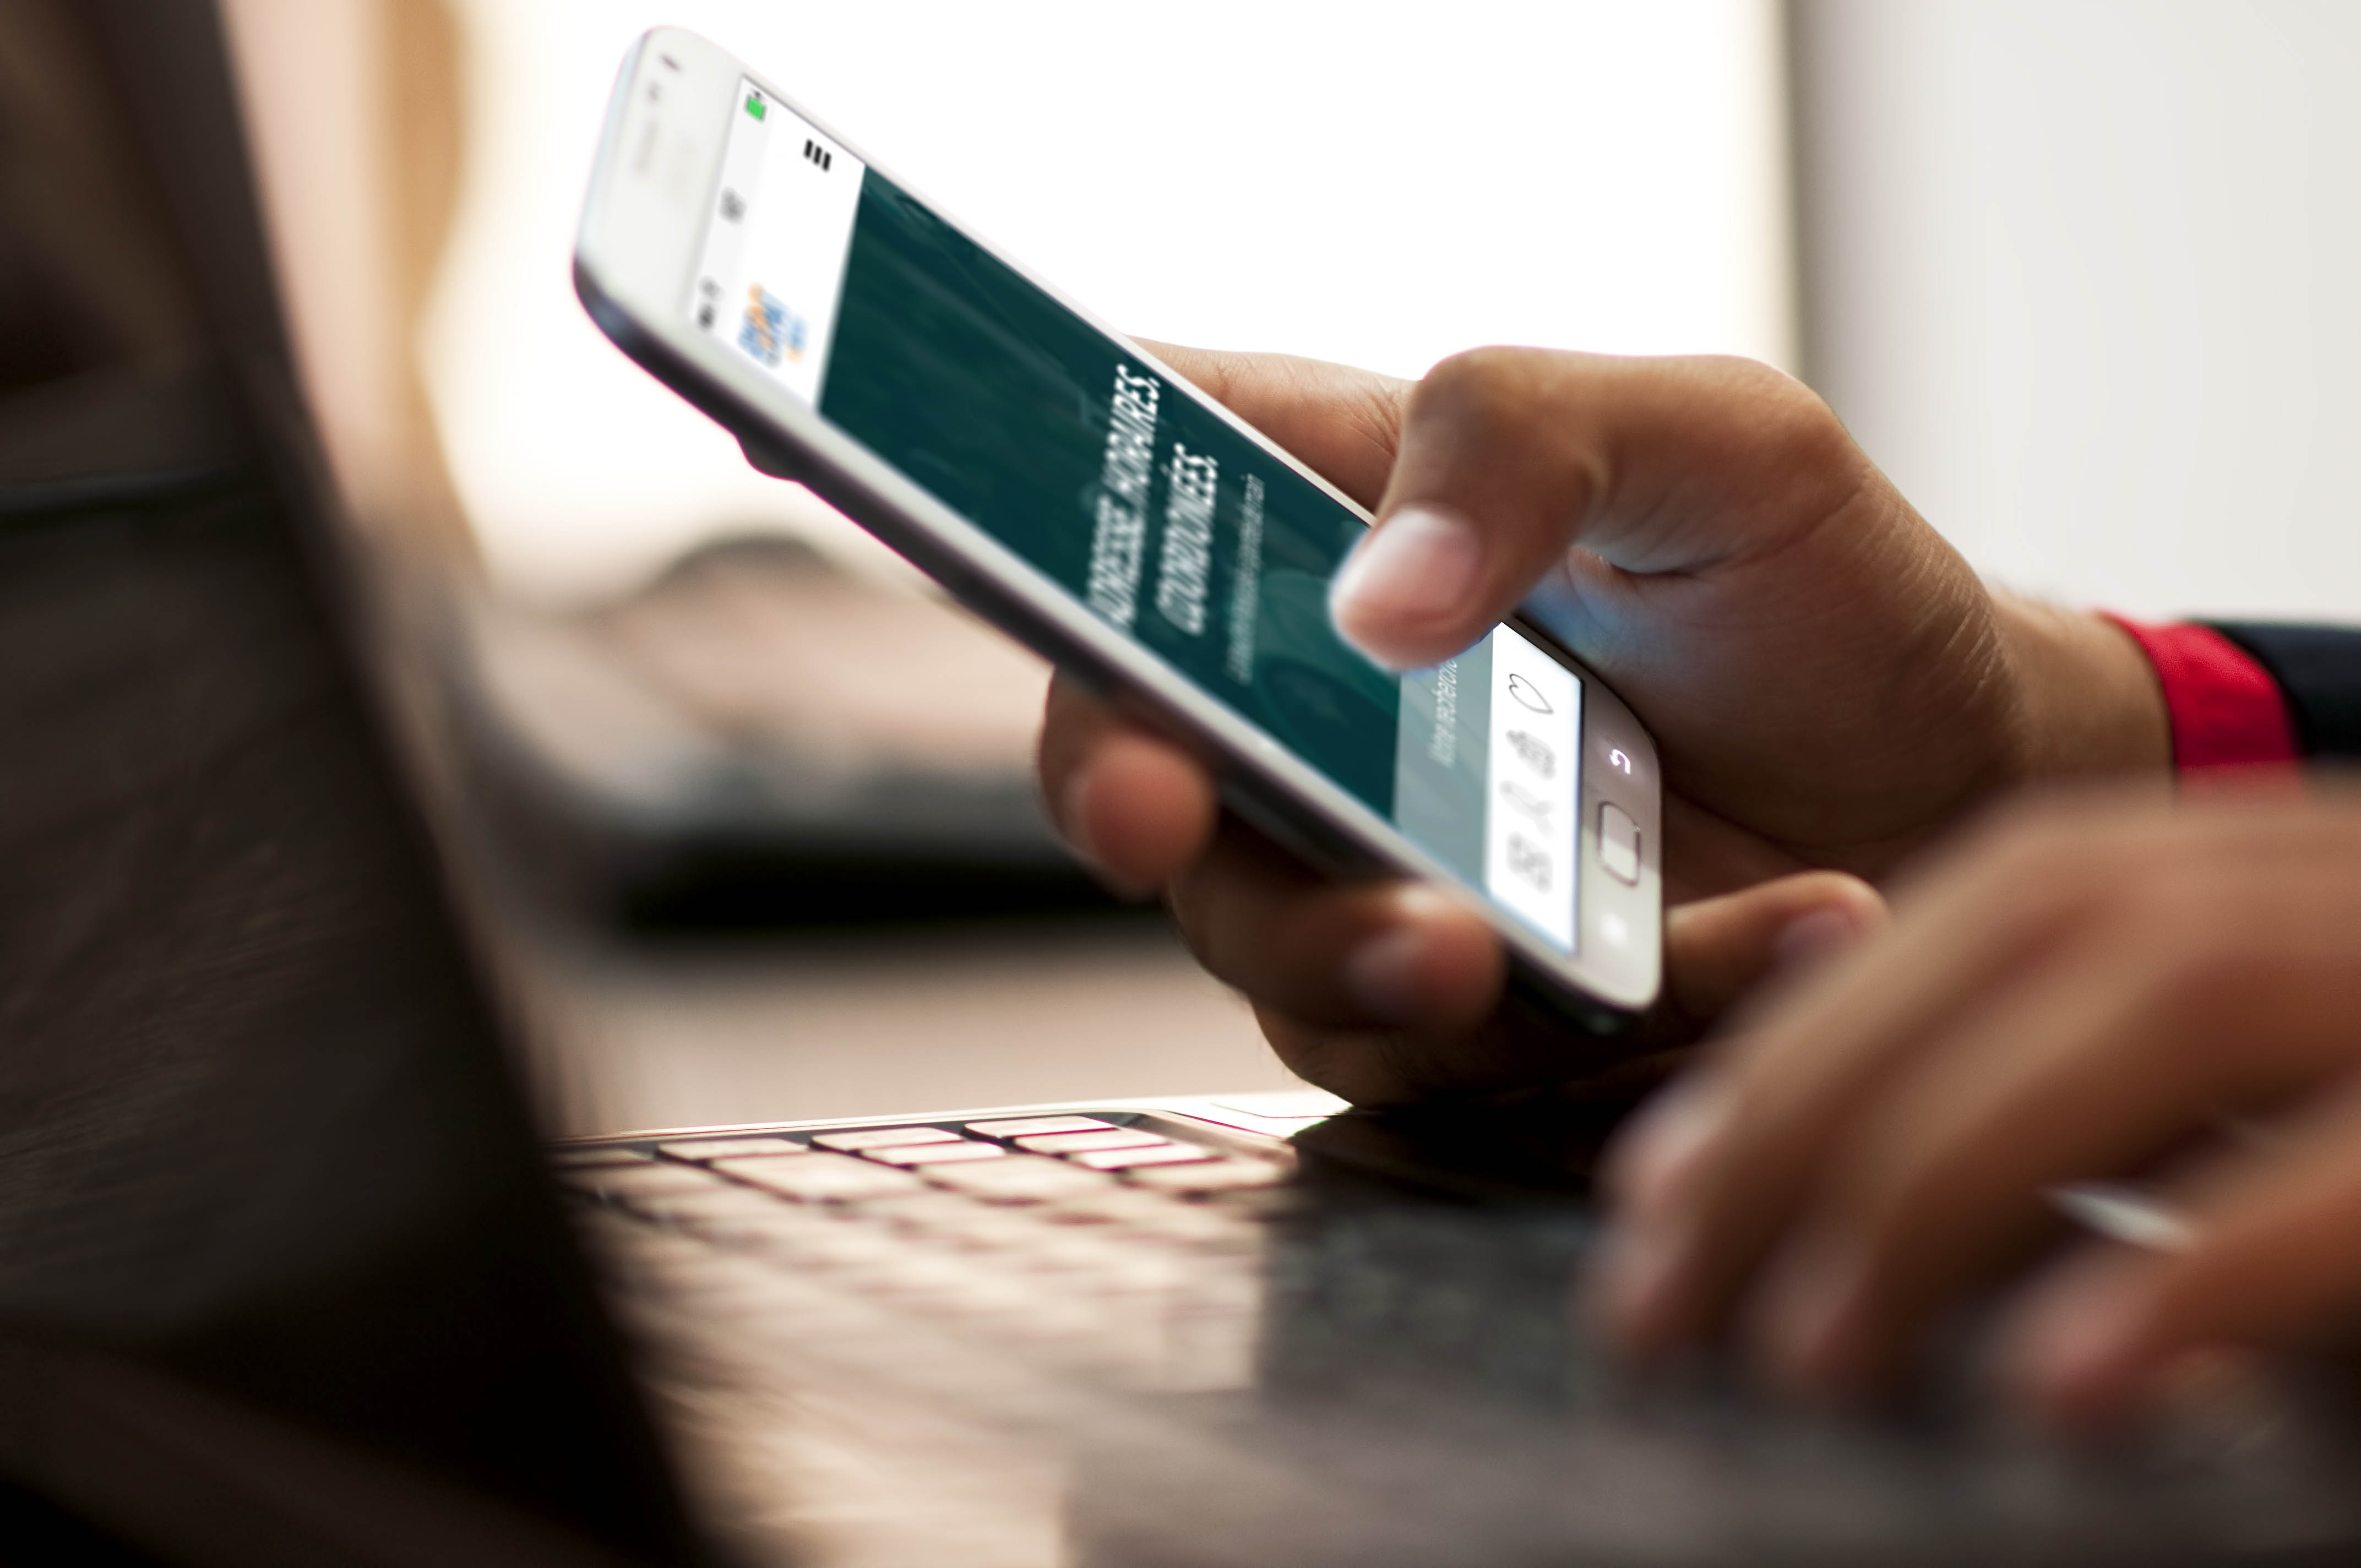 Smartphone - Expat by INOV